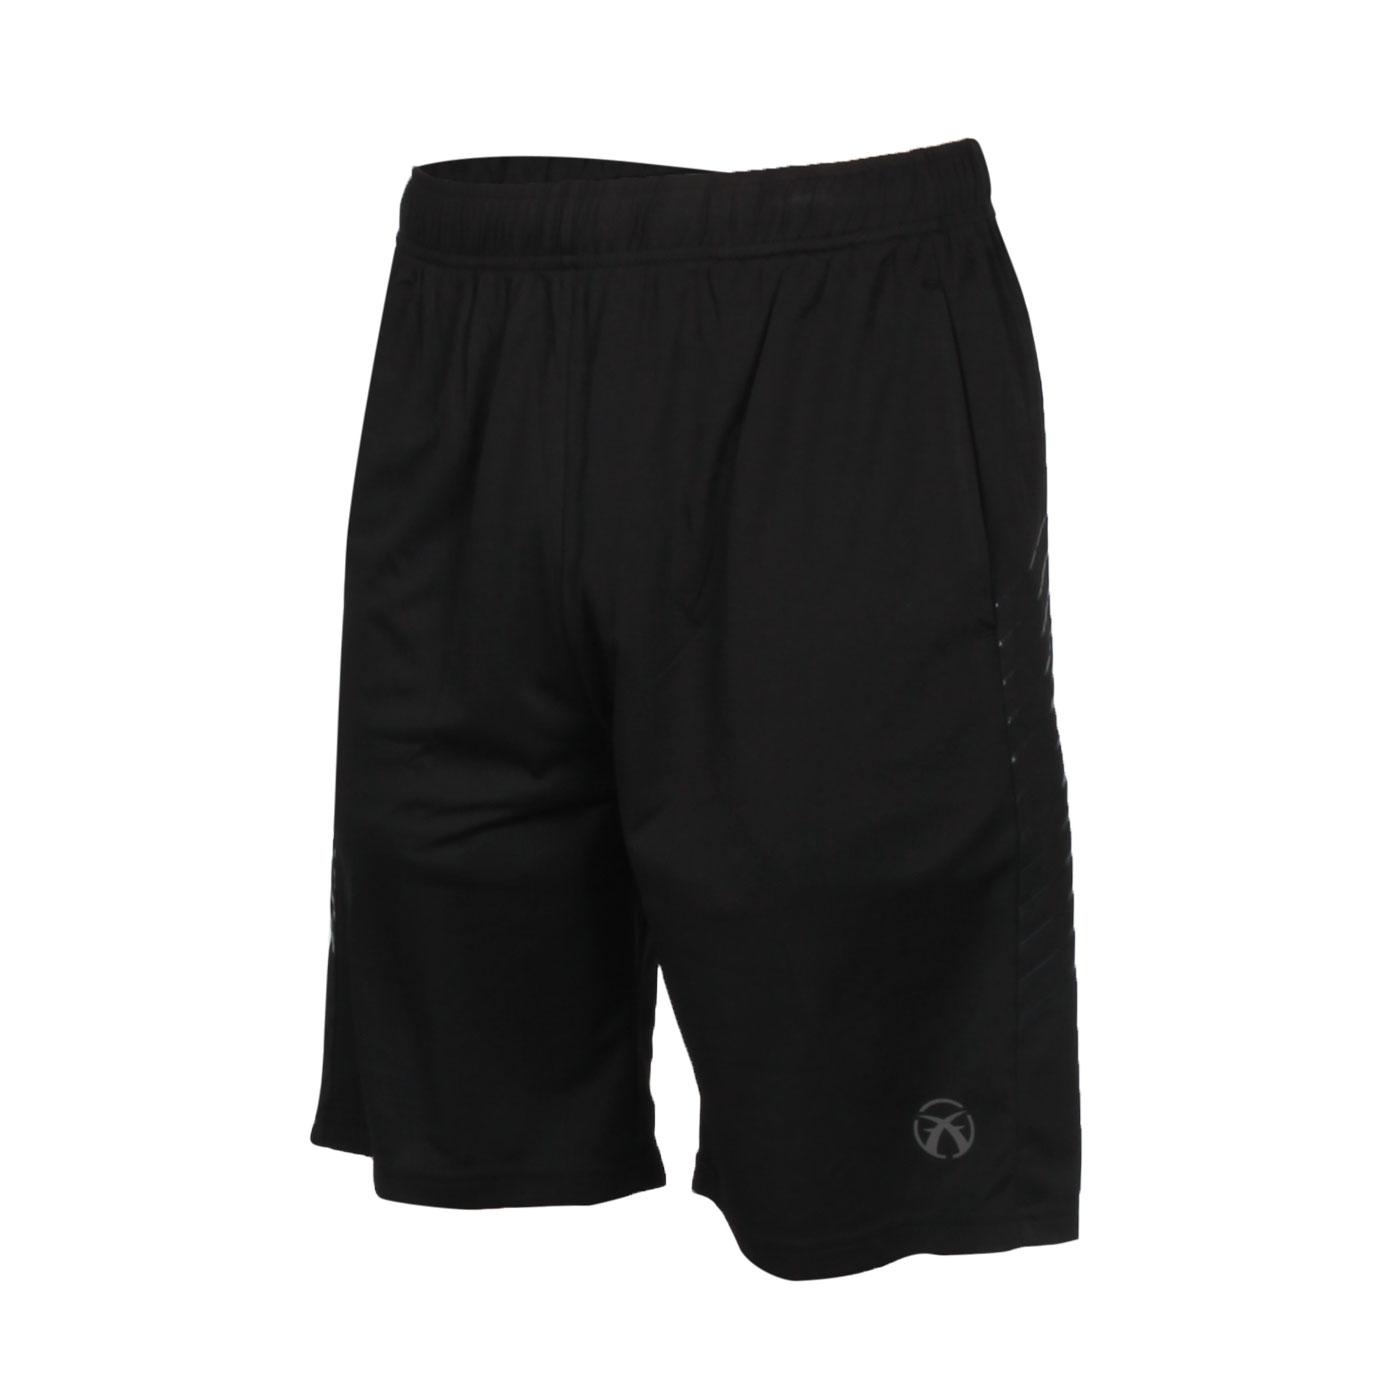 FIRESTAR 男款吸排訓練籃球褲 B0506-10